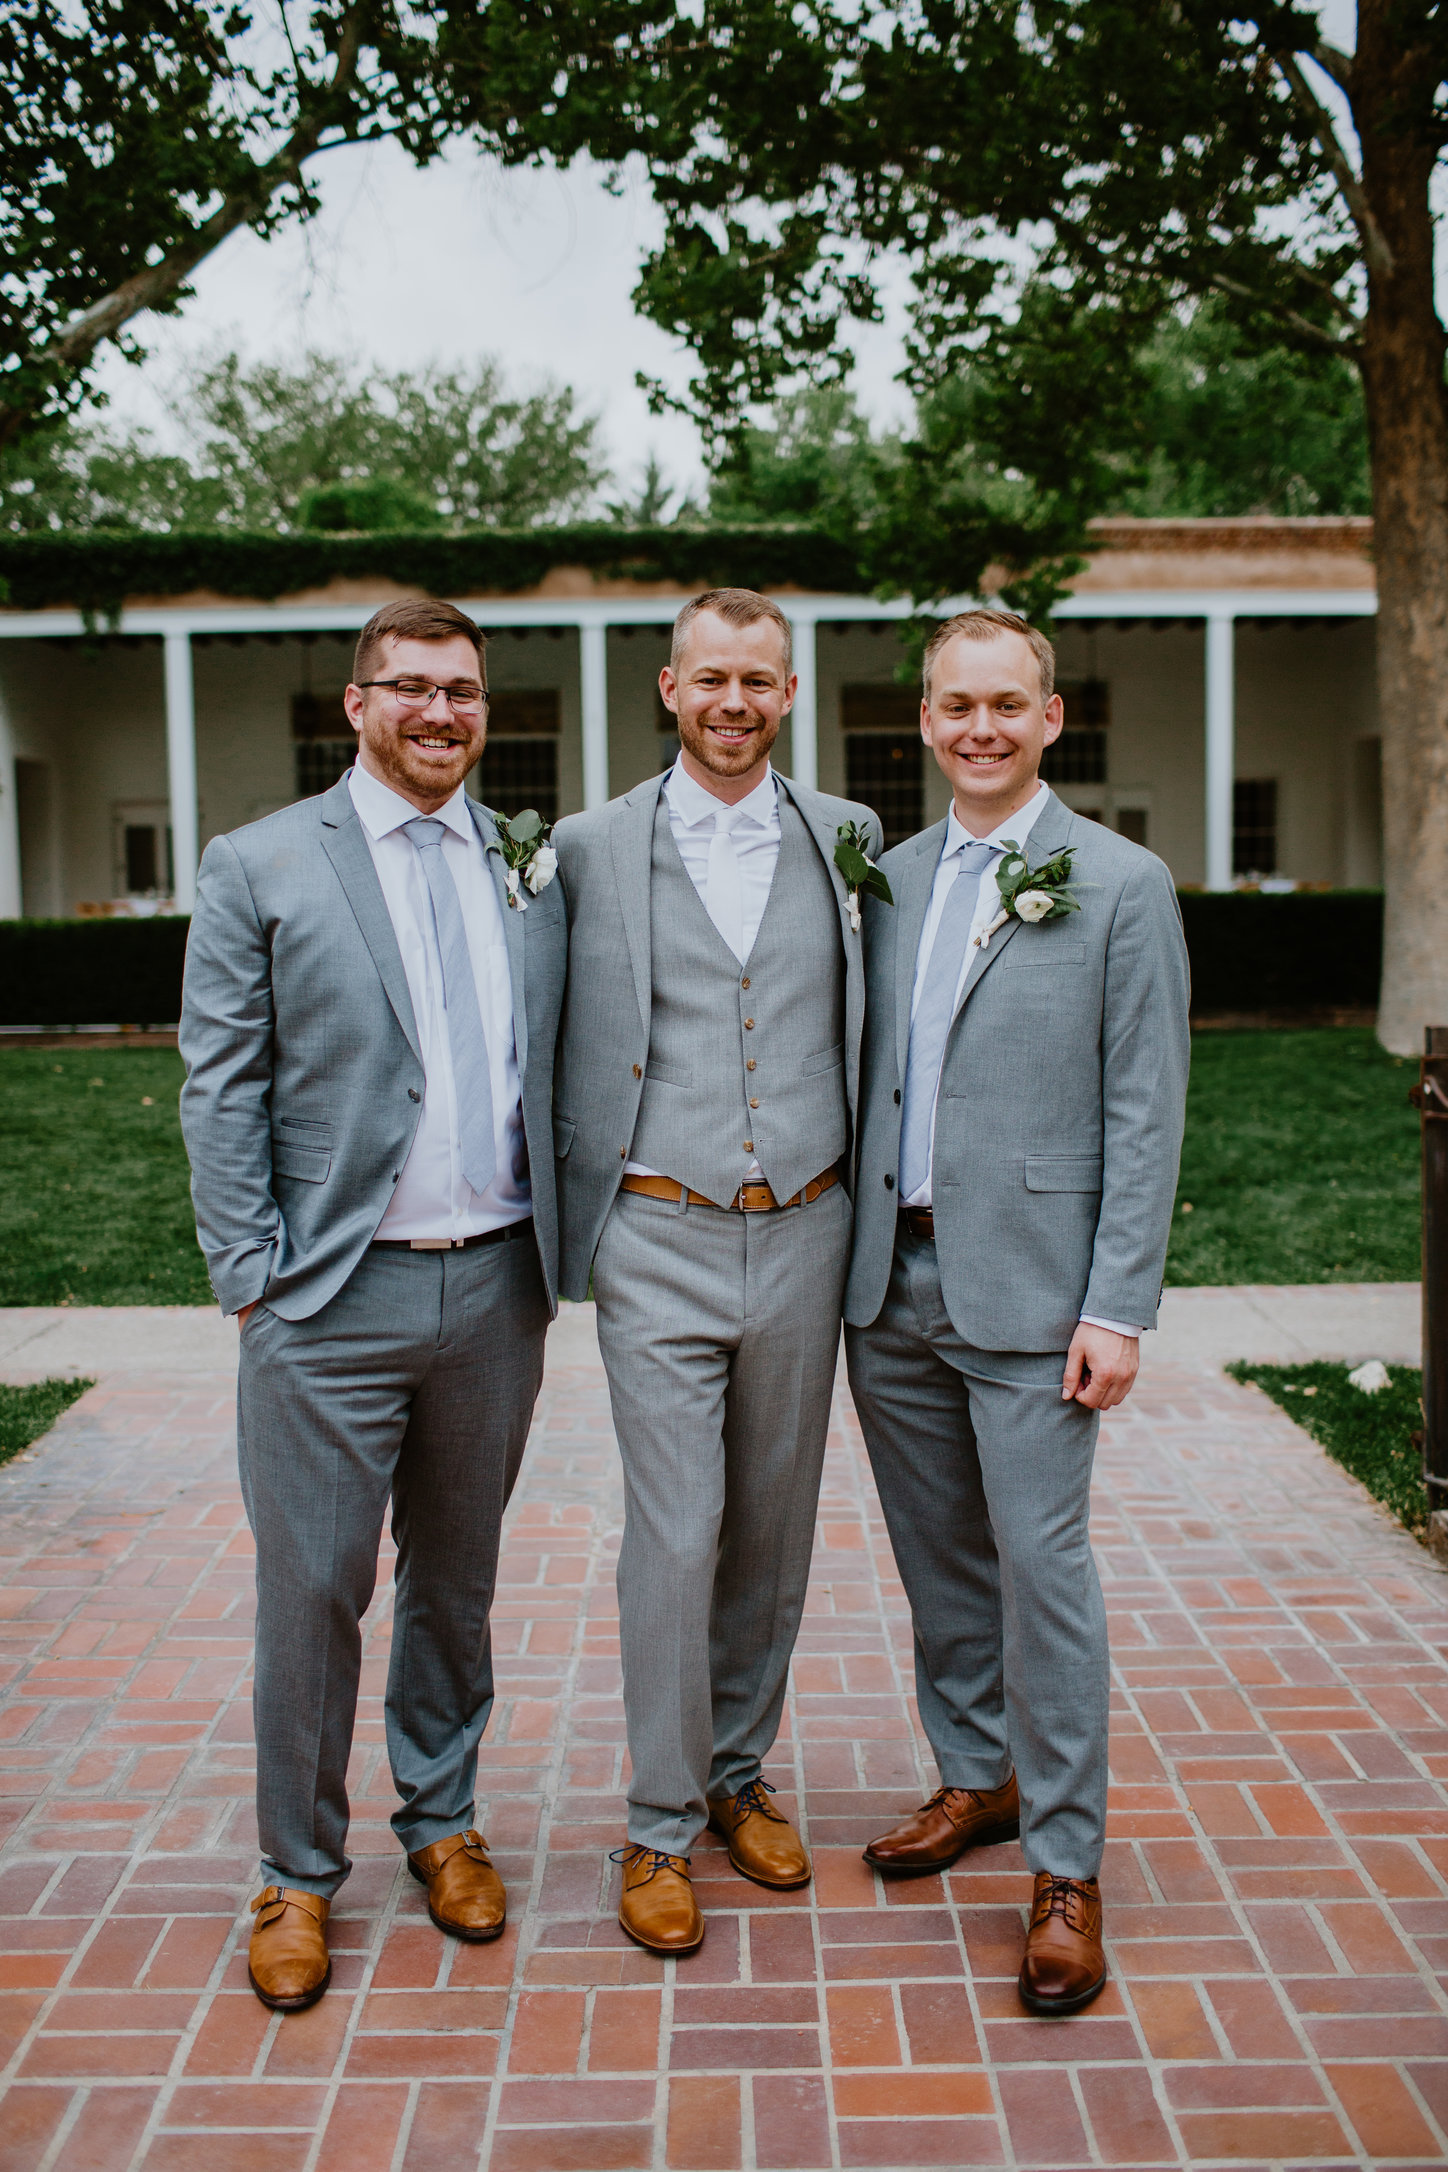 DandA-wedding-493.jpg